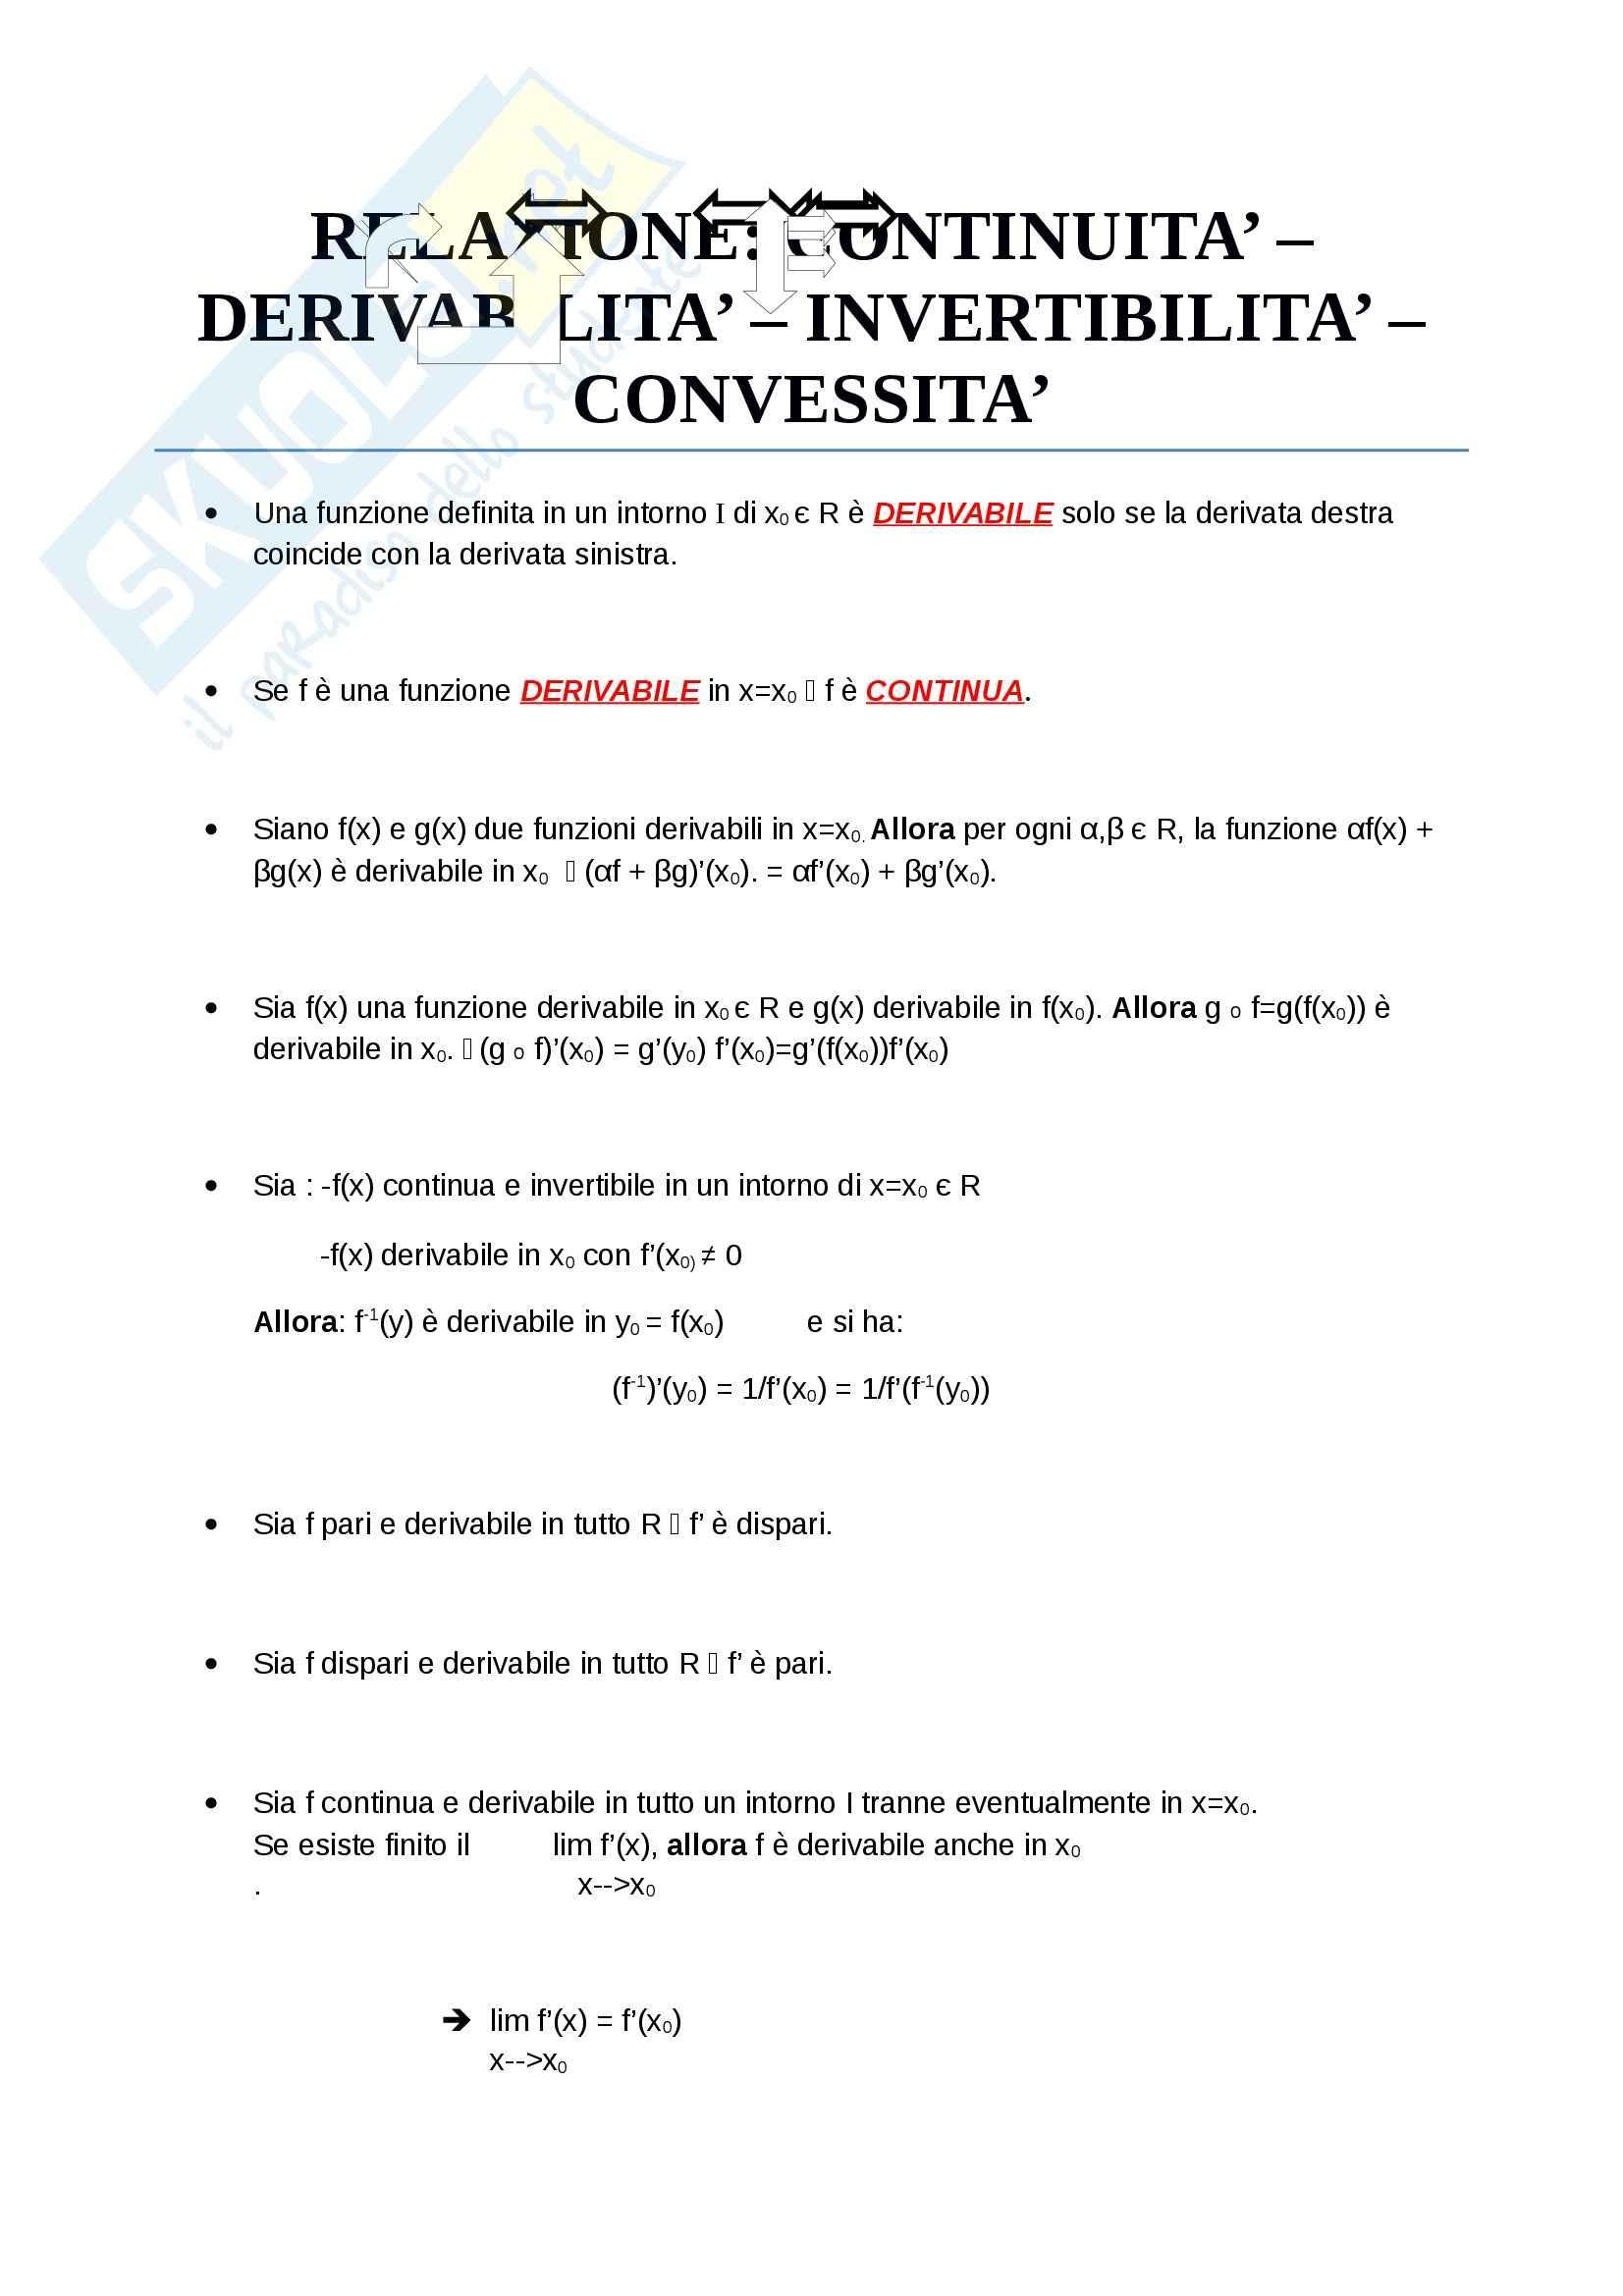 Analisi matematica I - Continuità, derivabilità, invertibilità e convessità di una funzione